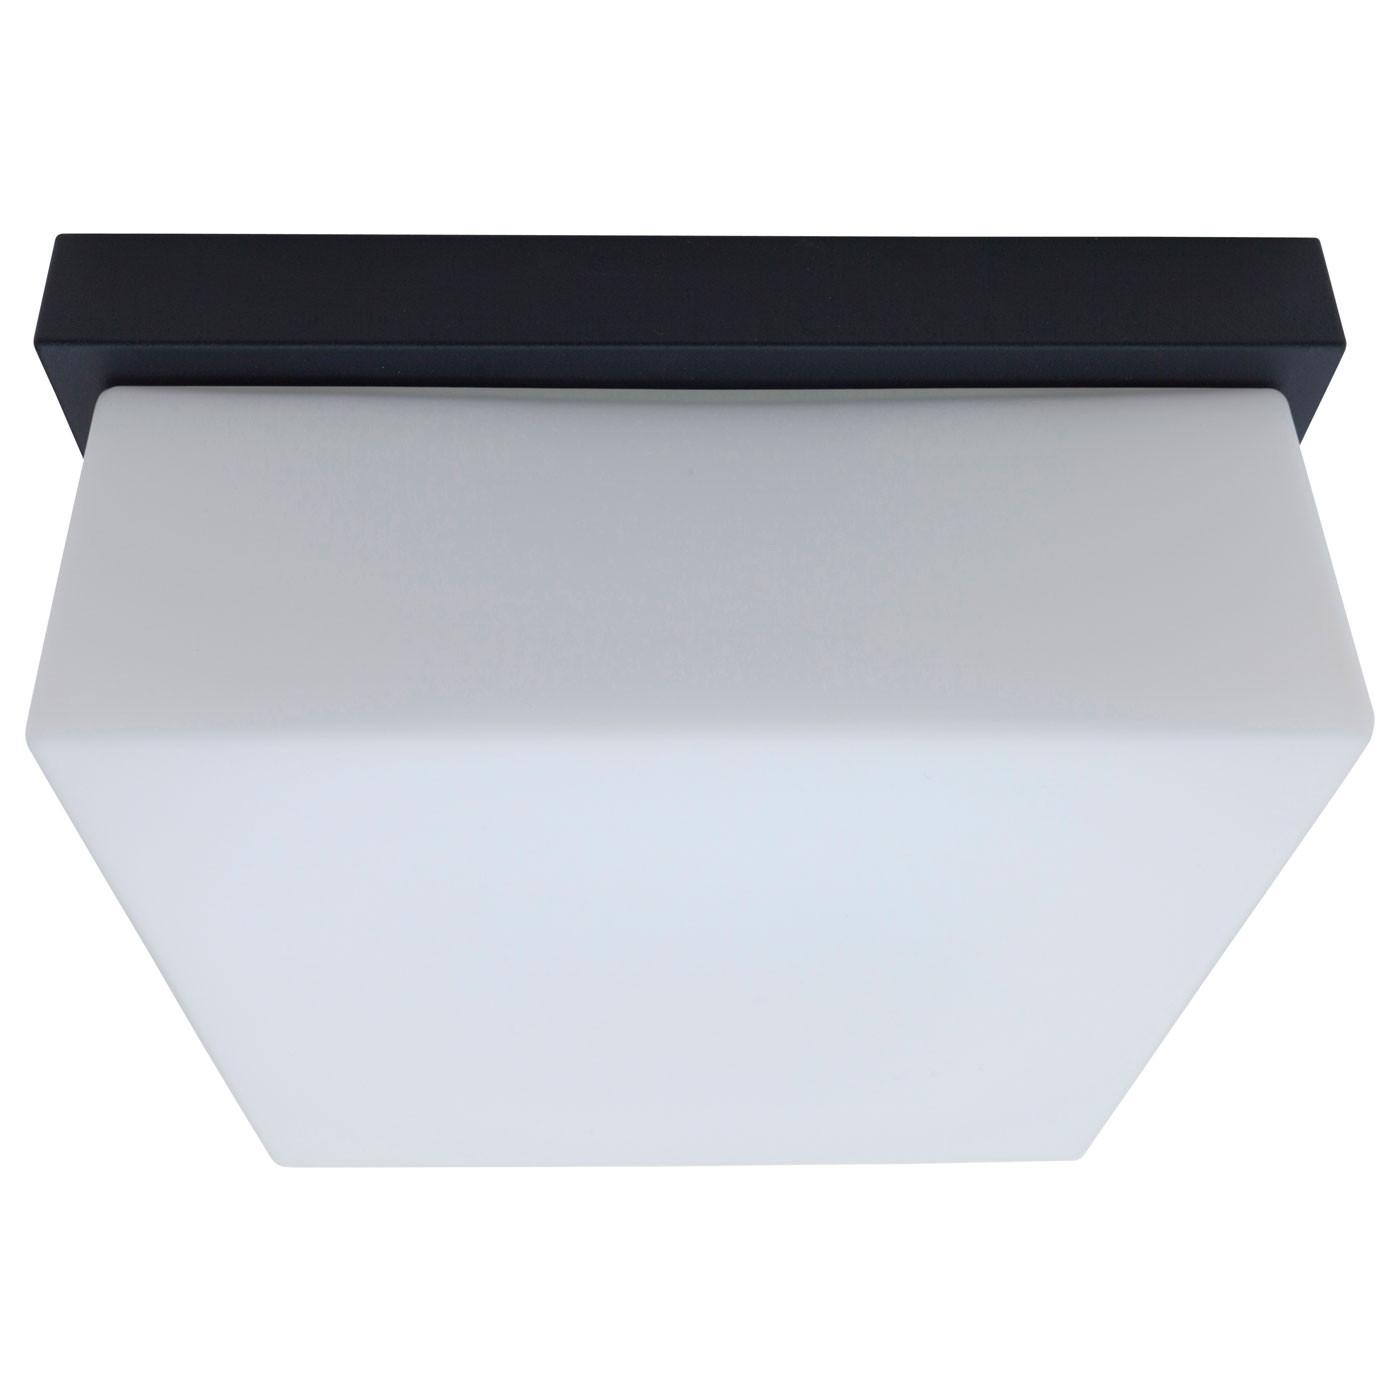 Bega 33036 LED Wand- oder Deckenleuchte